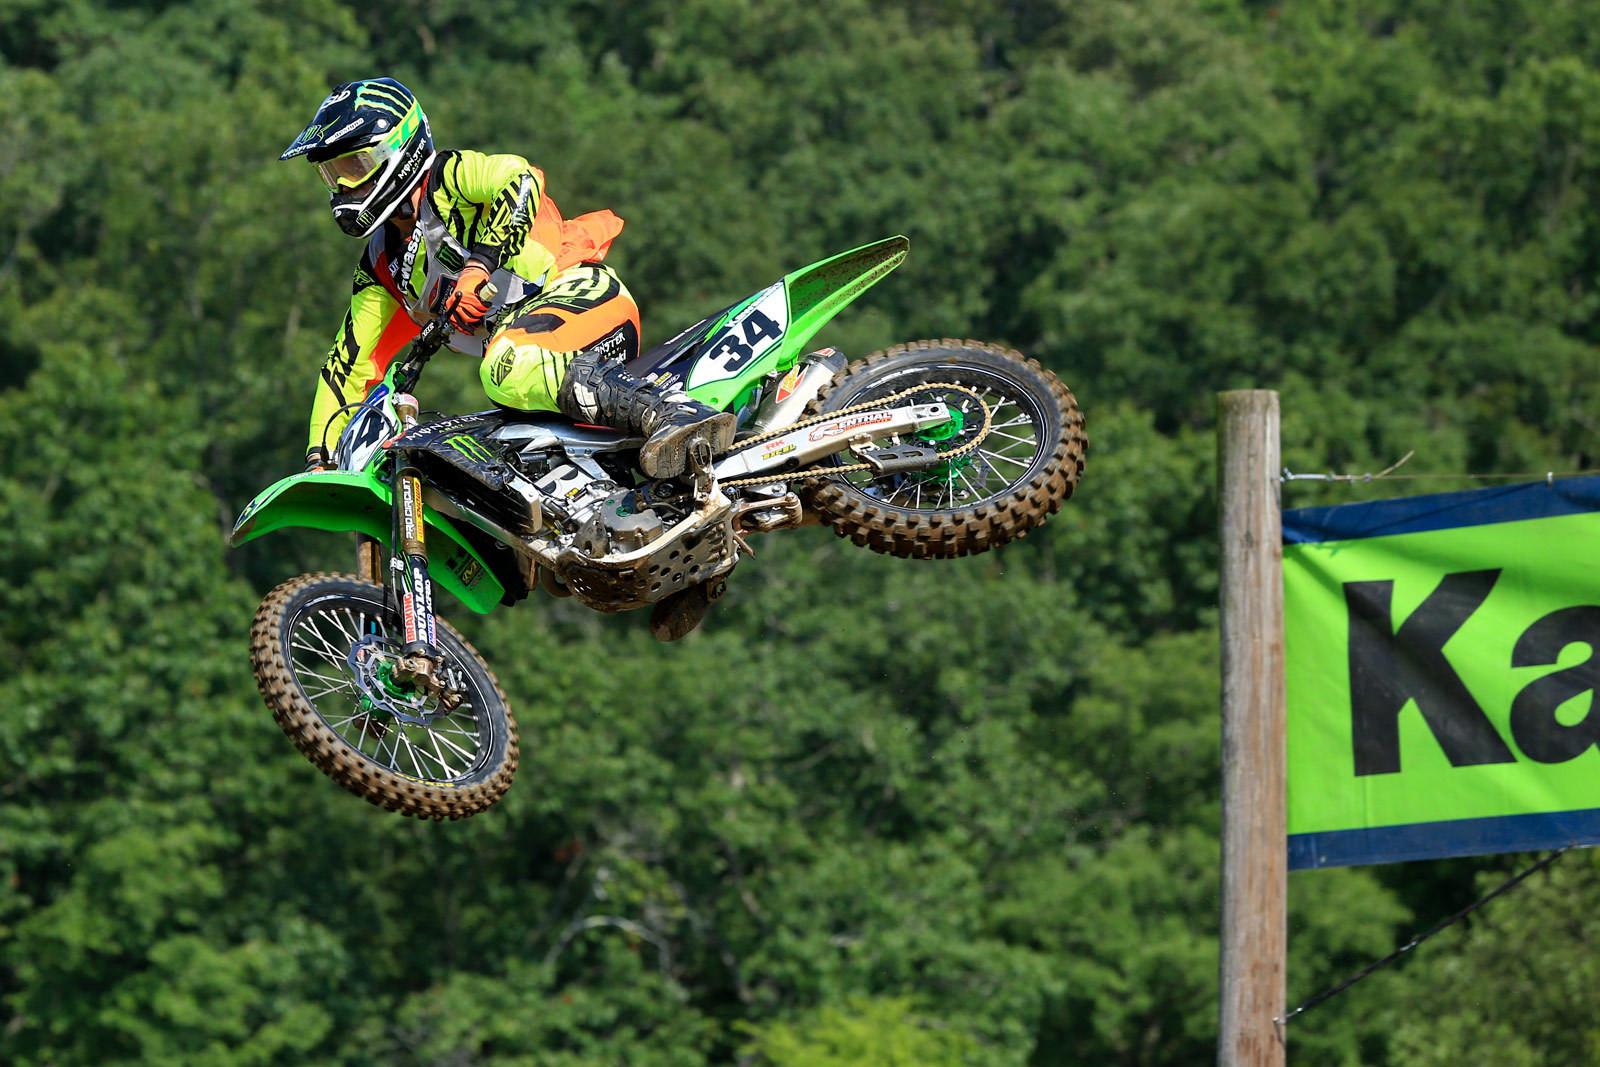 Mark Worth - Day 1: 2015 Rocky Mountain ATV/MC AMA Amateur National Motocross Championships  - Motocross Pictures - Vital MX